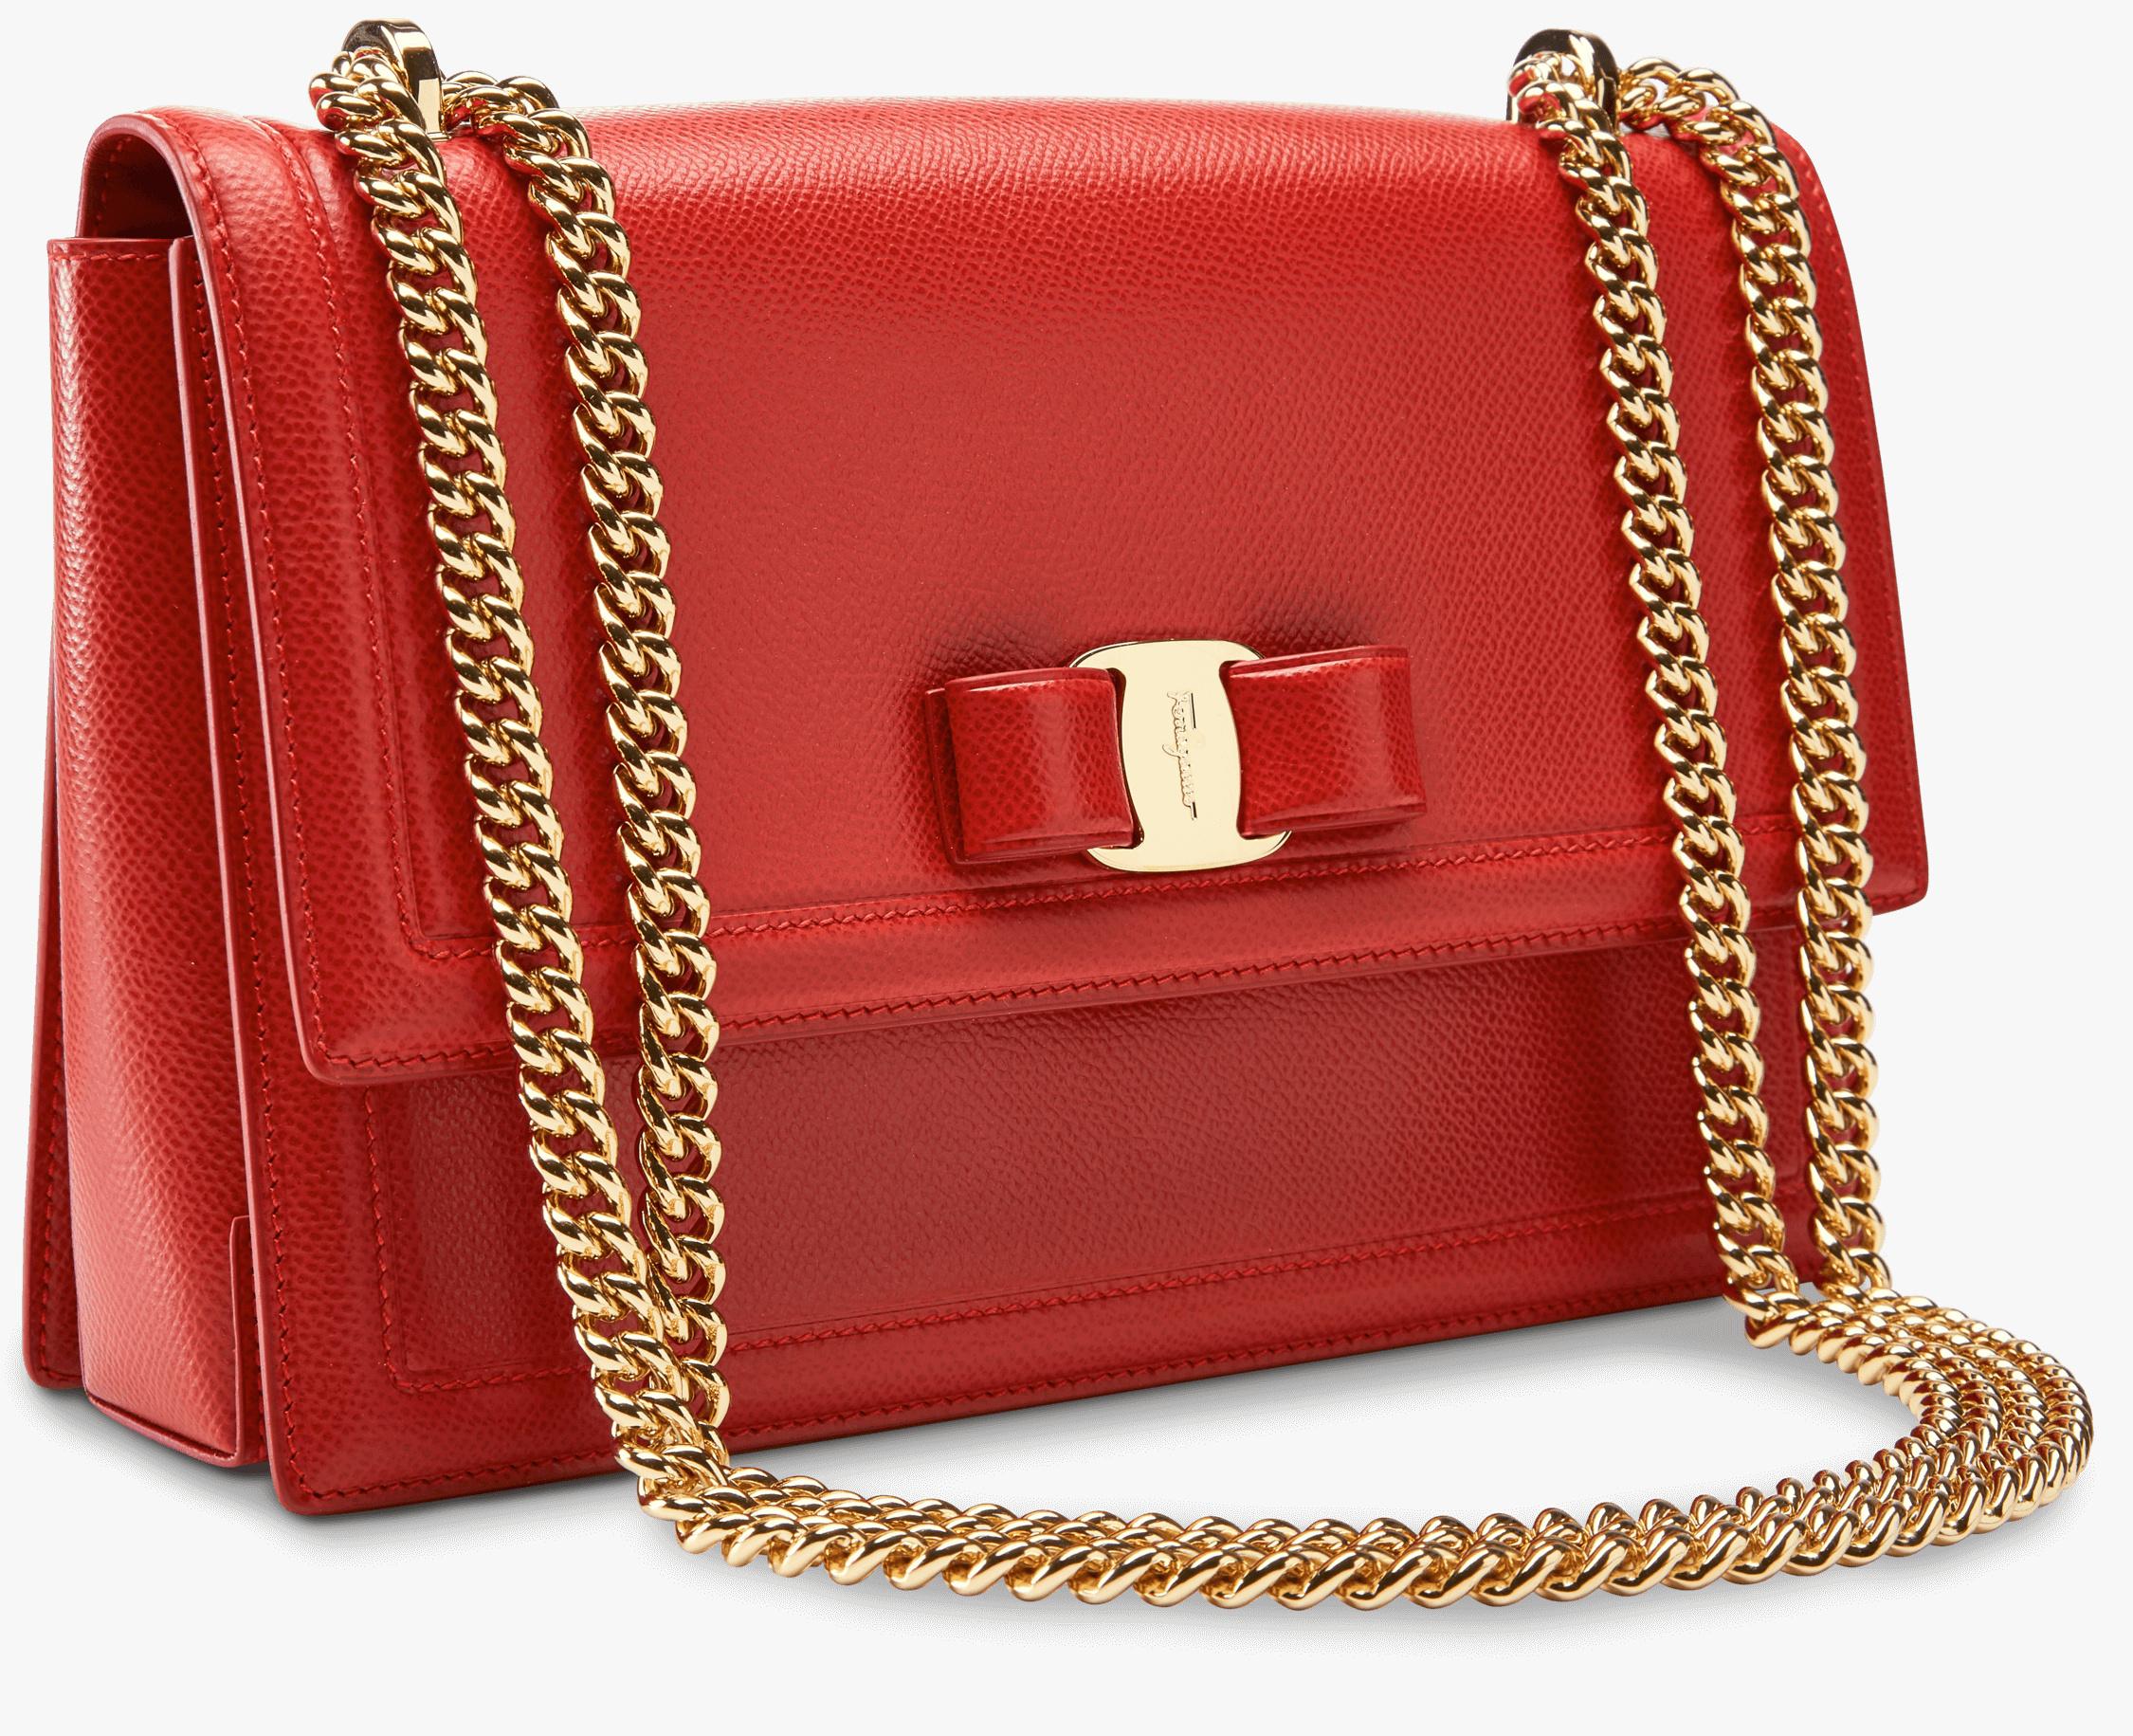 Medium Vara Shoulder Bag Salvatore Ferragamo